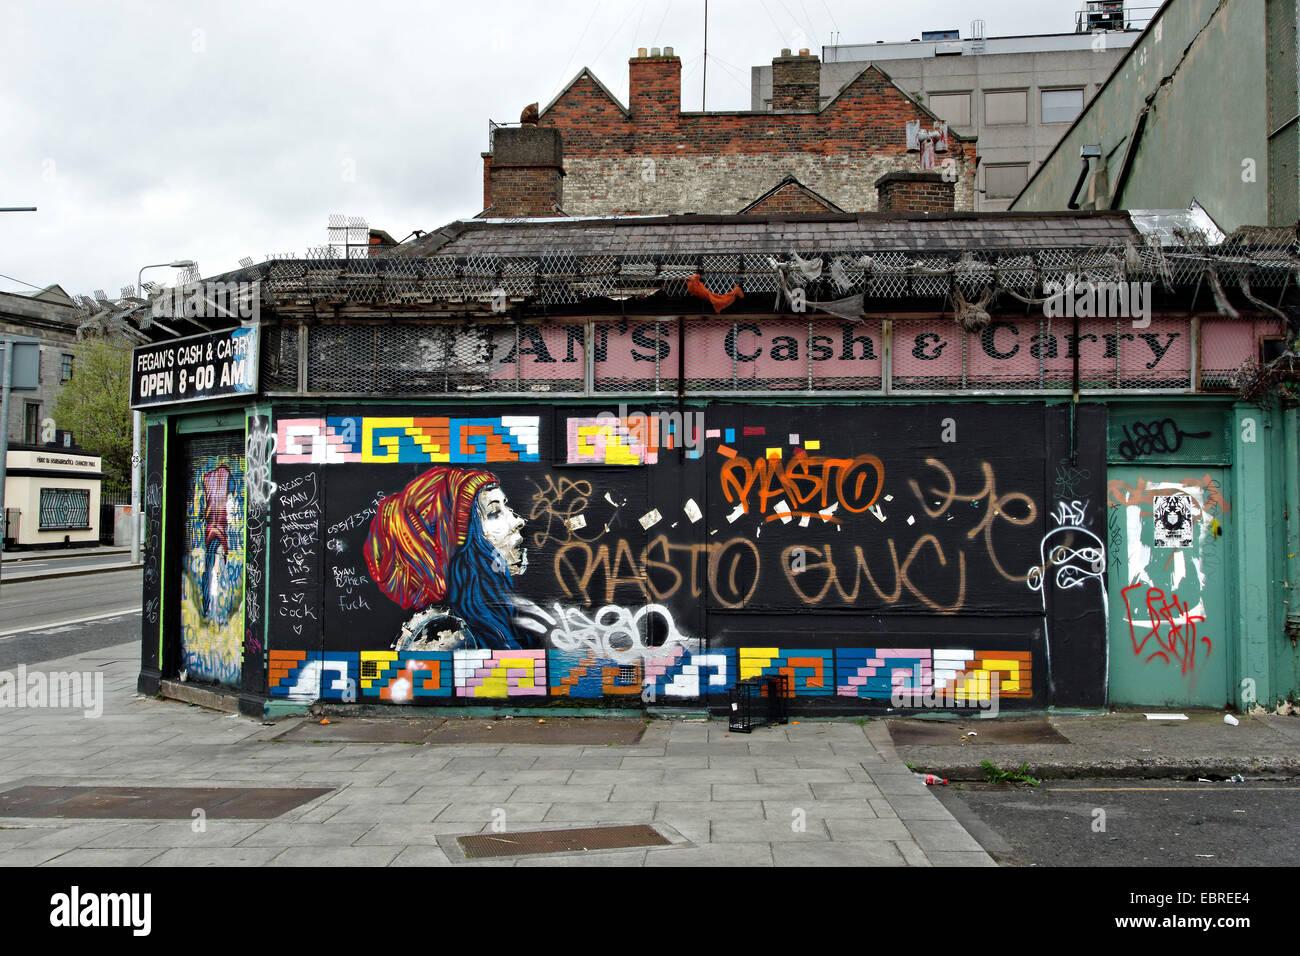 Graffiti wall dublin - Stock Photo Wall Graffiti On A Corner Shop Dublin Republic Of Ireland Europe